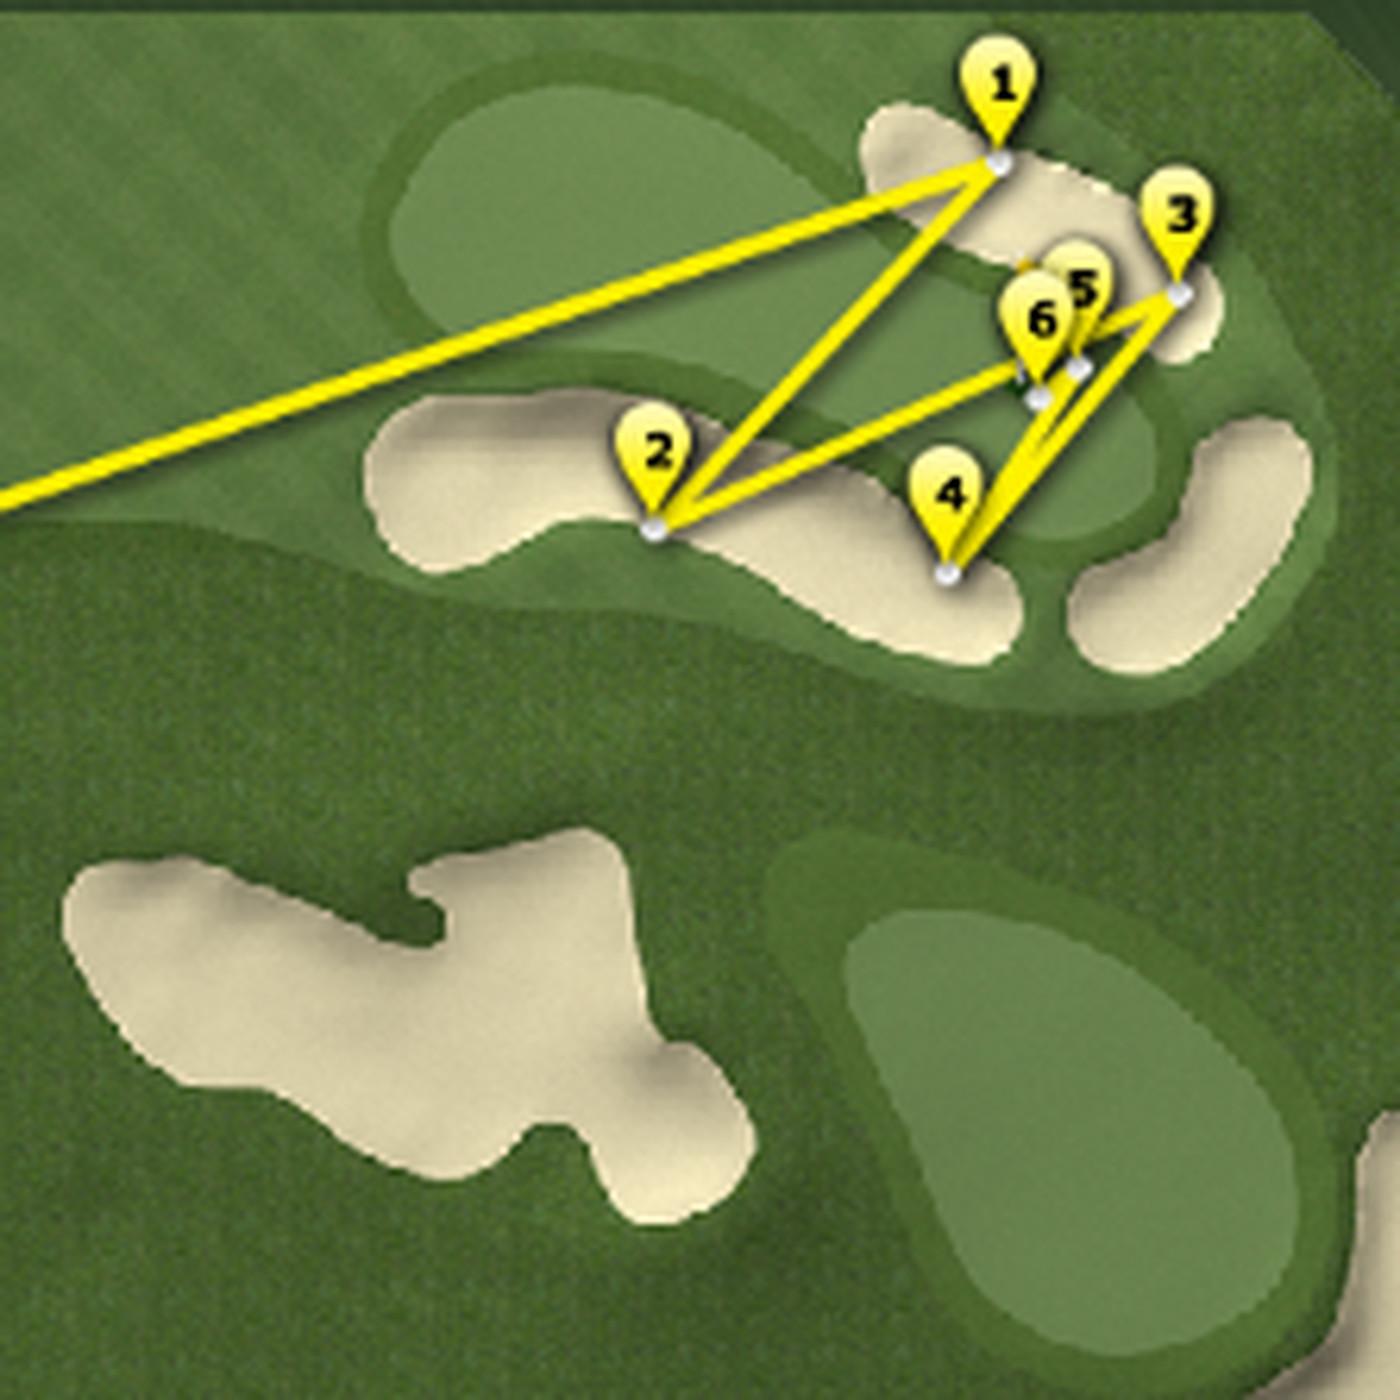 Free download clip art. Golf clipart sand trap